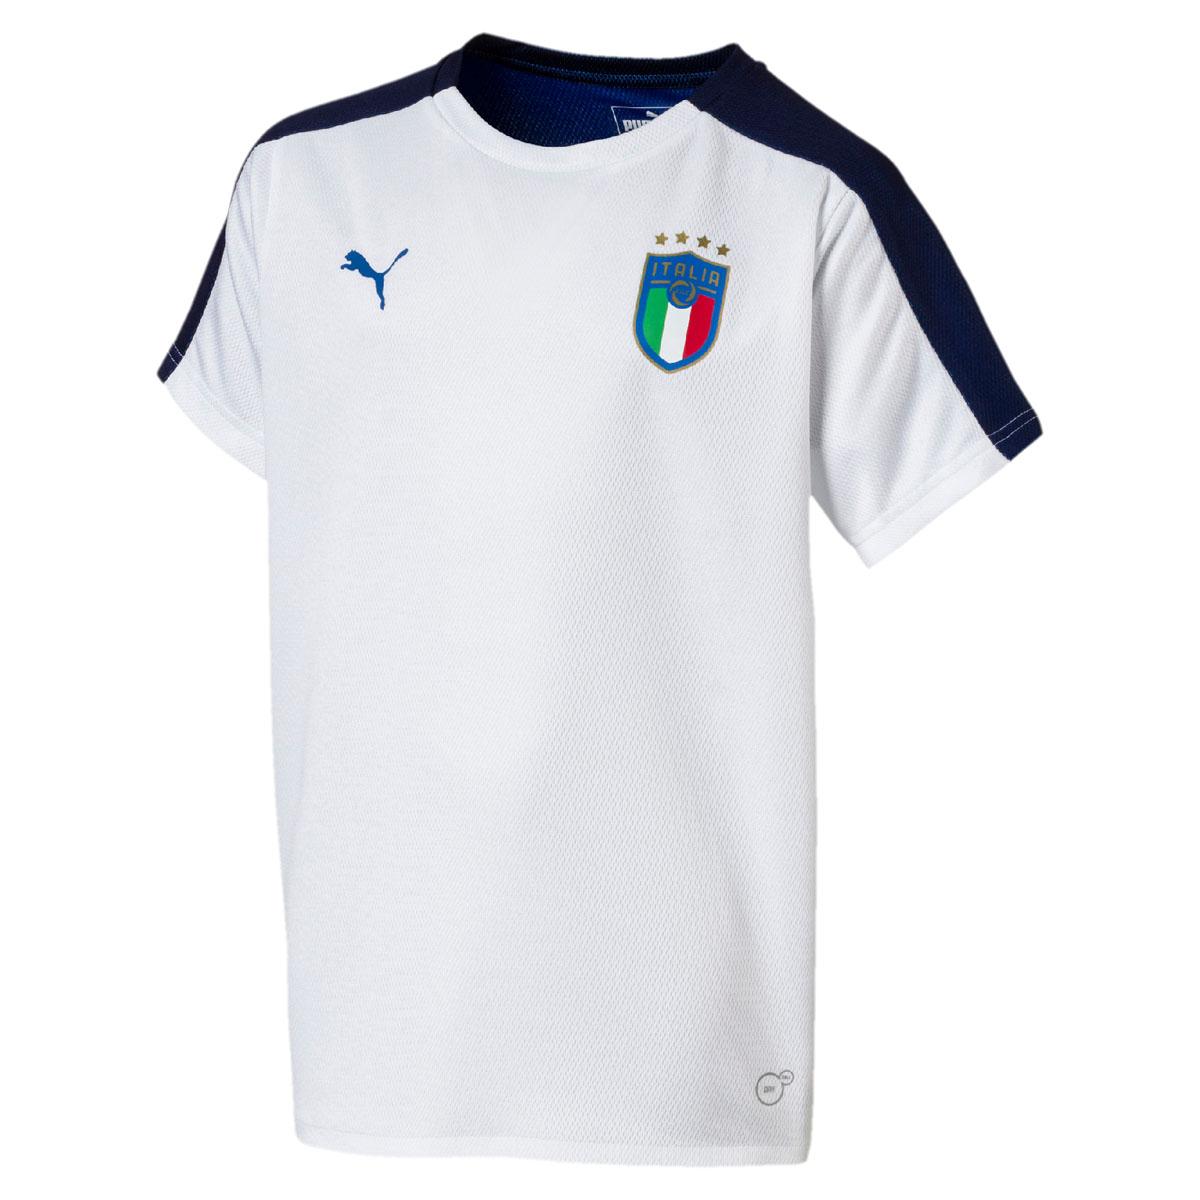 Футболка для мальчика Puma FIGC Italia Jersey SS Jr, цвет: белый. 753102027. Размер 164753102027